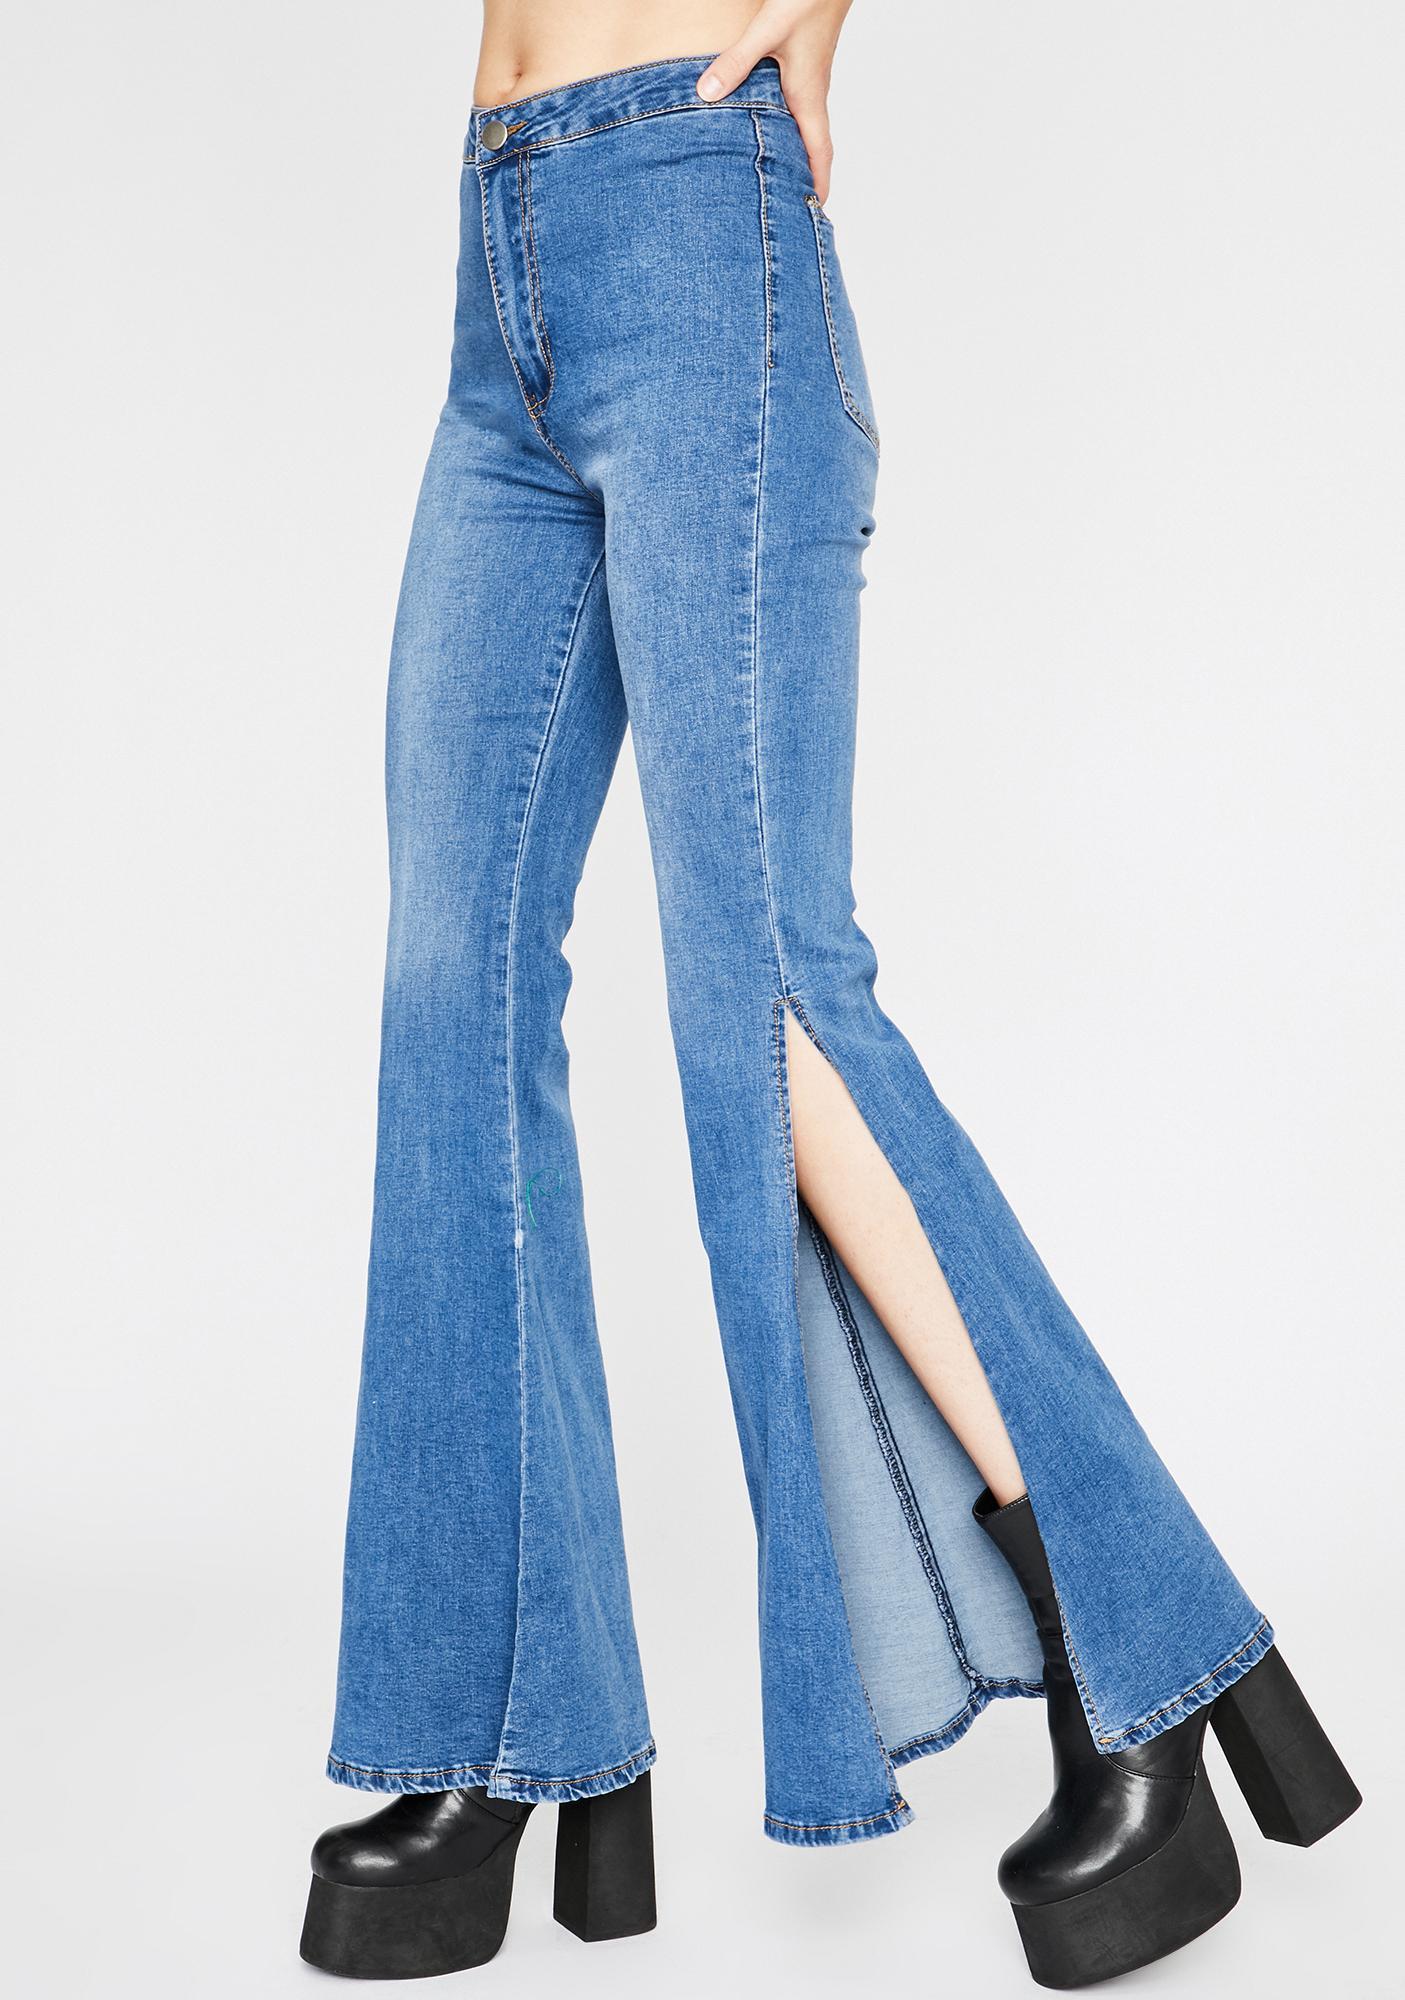 scarpe da skate acquista l'originale colori e suggestivi Movin' N' Groovin' Flare Jeans